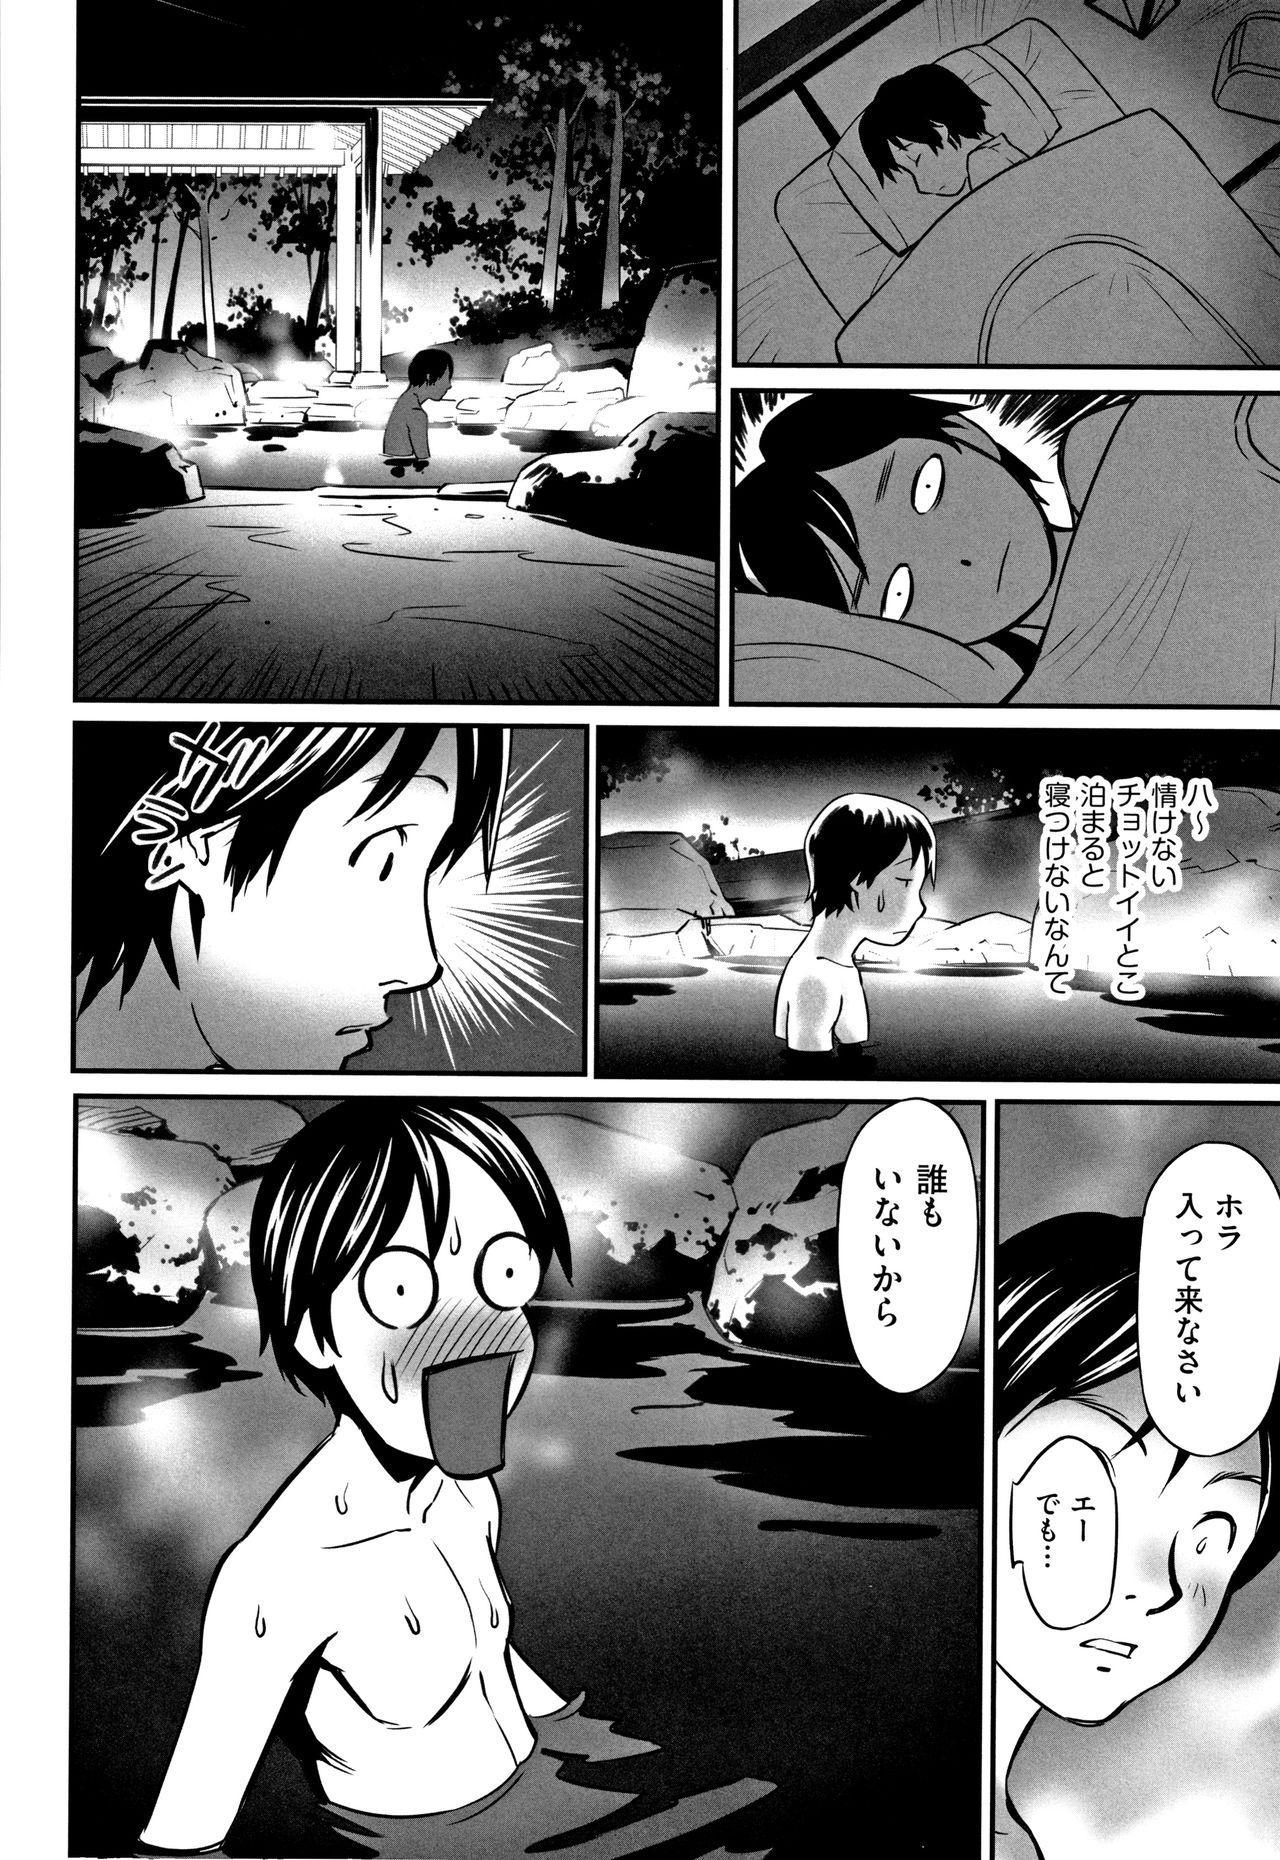 Shoujo Kumikyoku 11 154